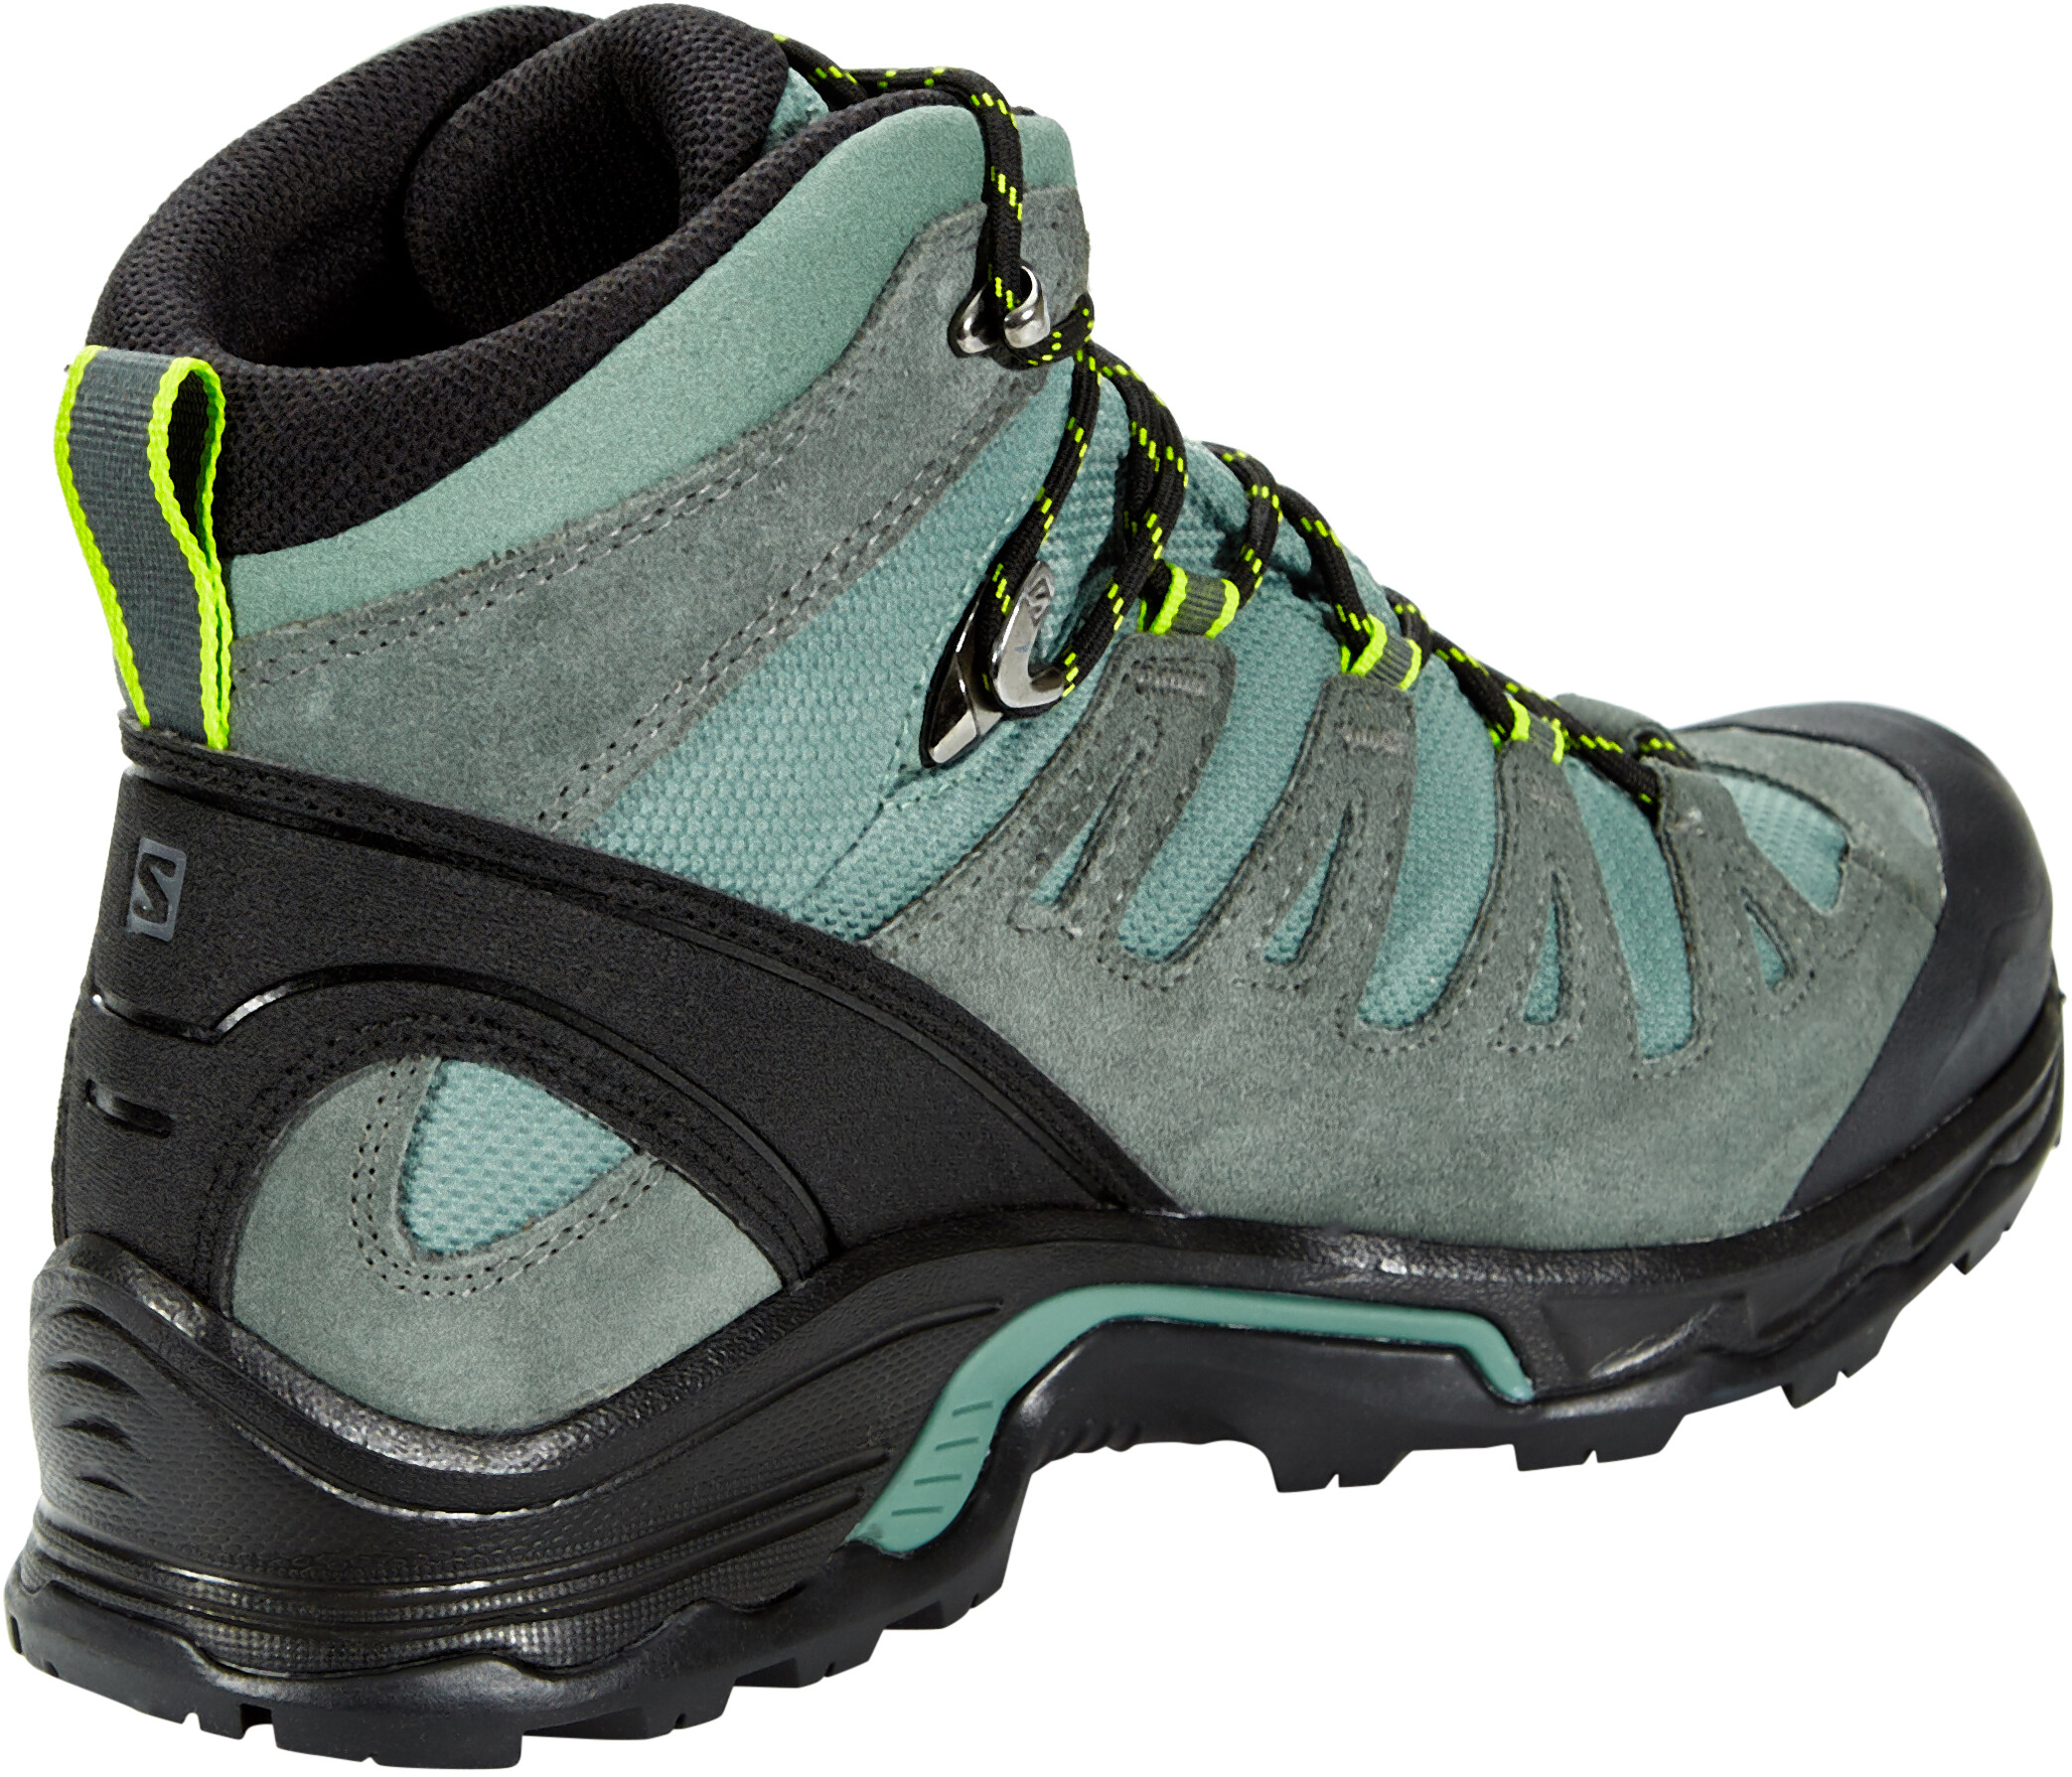 667540d7d843 Salomon Quest Prime GTX Shoes Men Balsam Green Urban Chic Lime Green ...